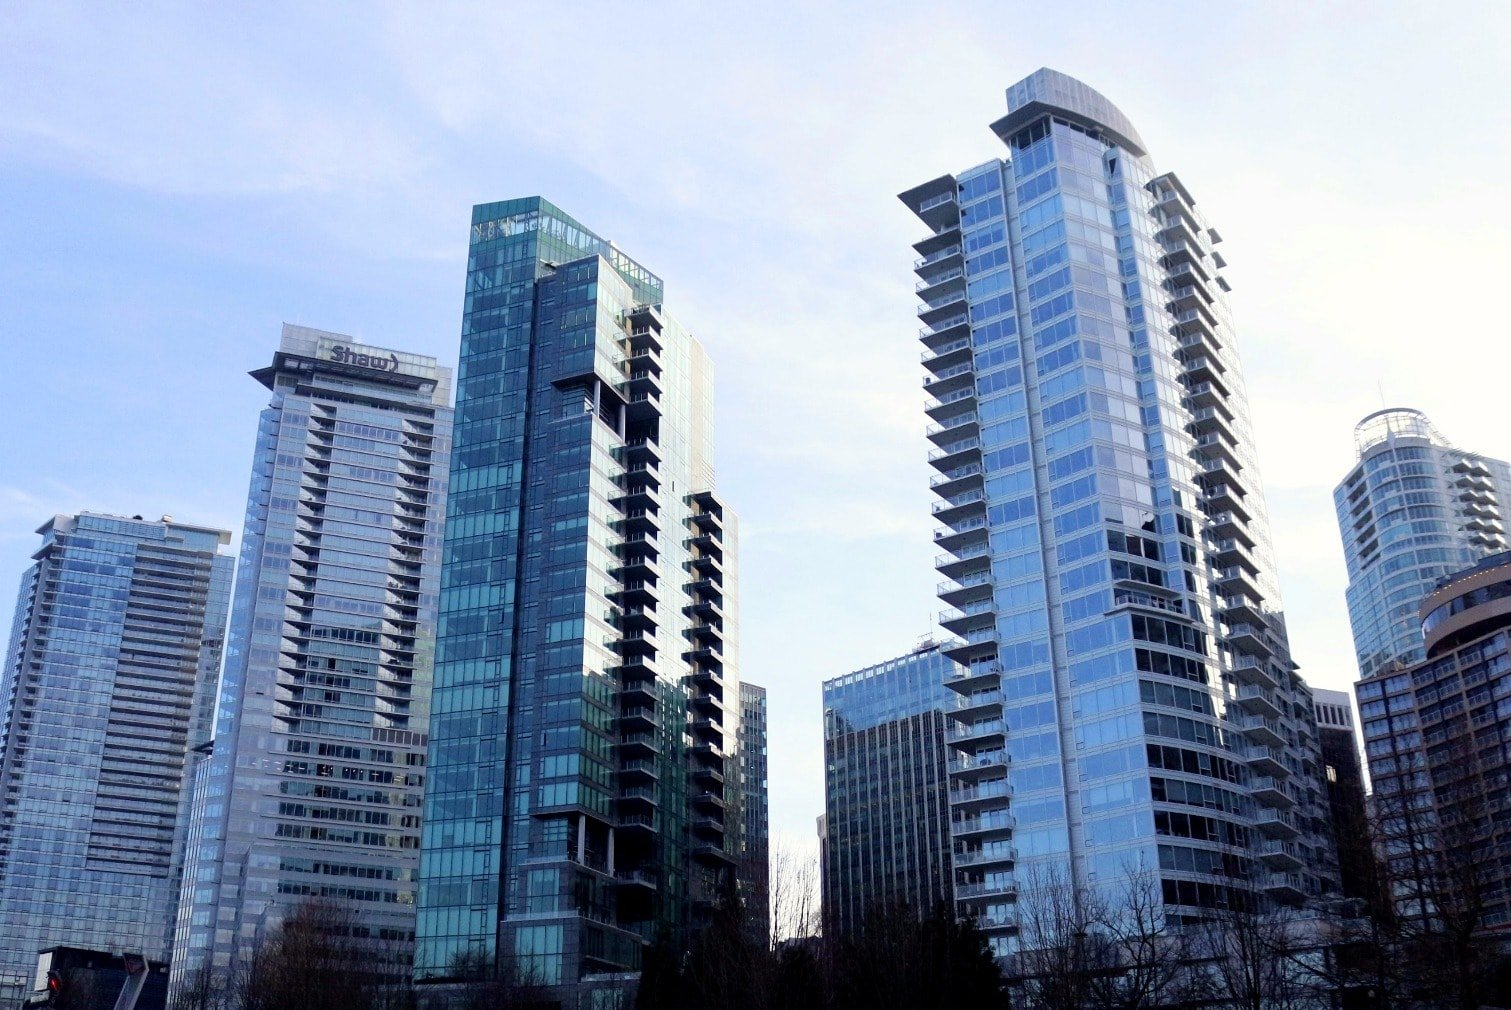 Intercâmbio Vancouver